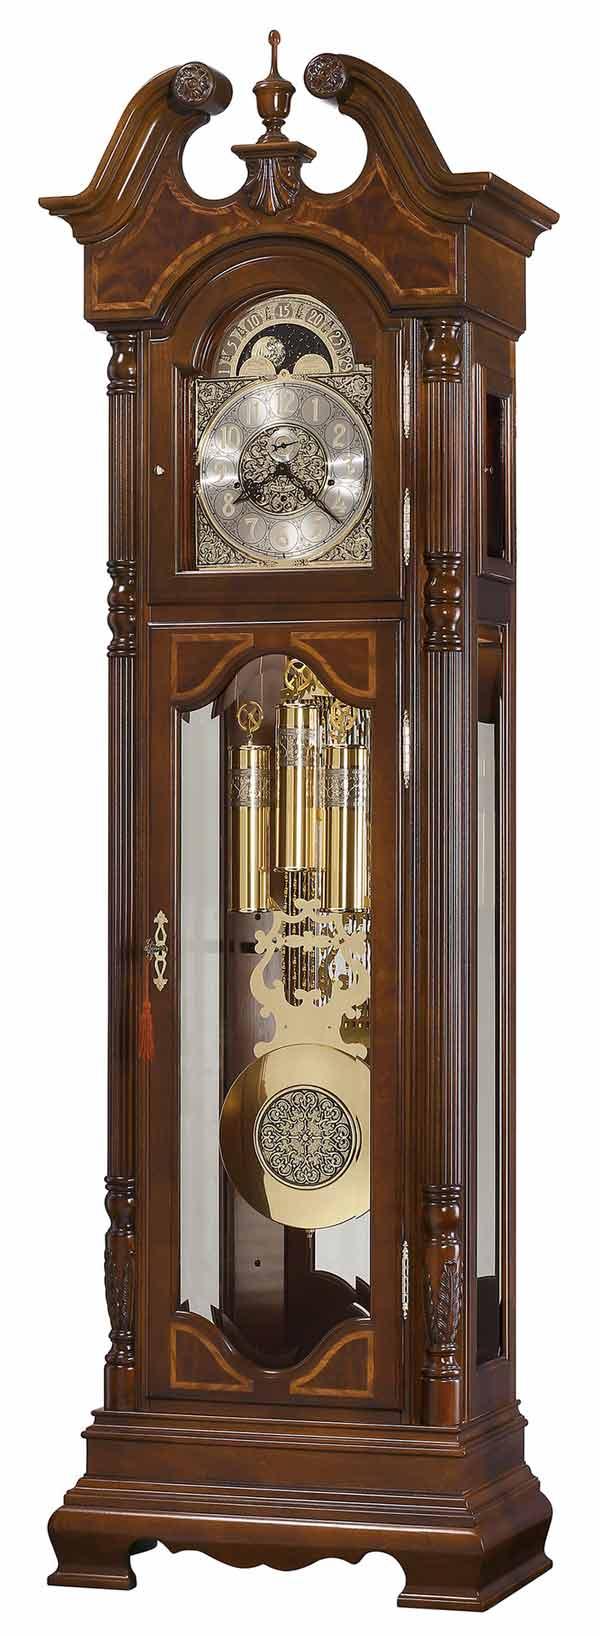 Howard Miller Polk 611 246 Grandfather Clock The Clock Depot